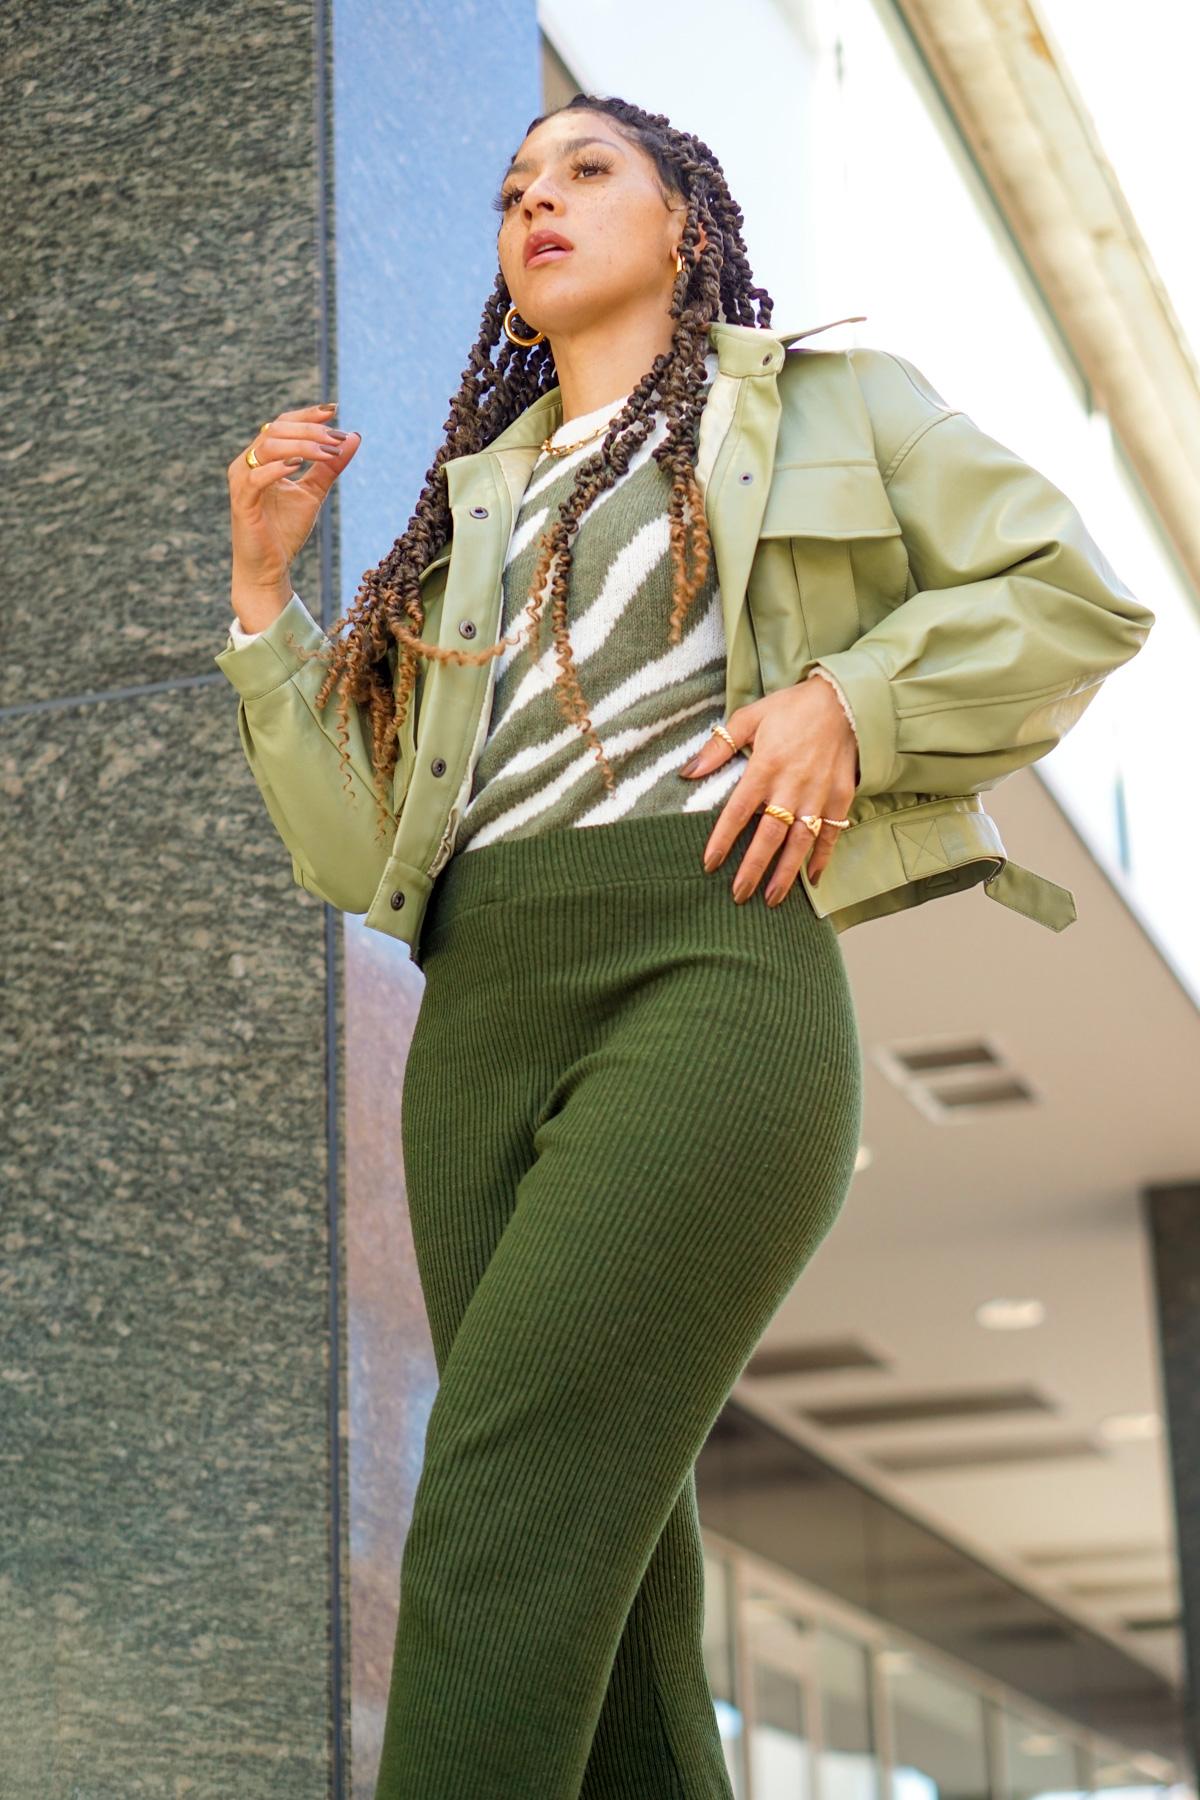 knit flare pants outfit idea, black fashion blogger, flare pants outfit street style, spring fashion black girl, spring fashion, how to wear knit flare pants